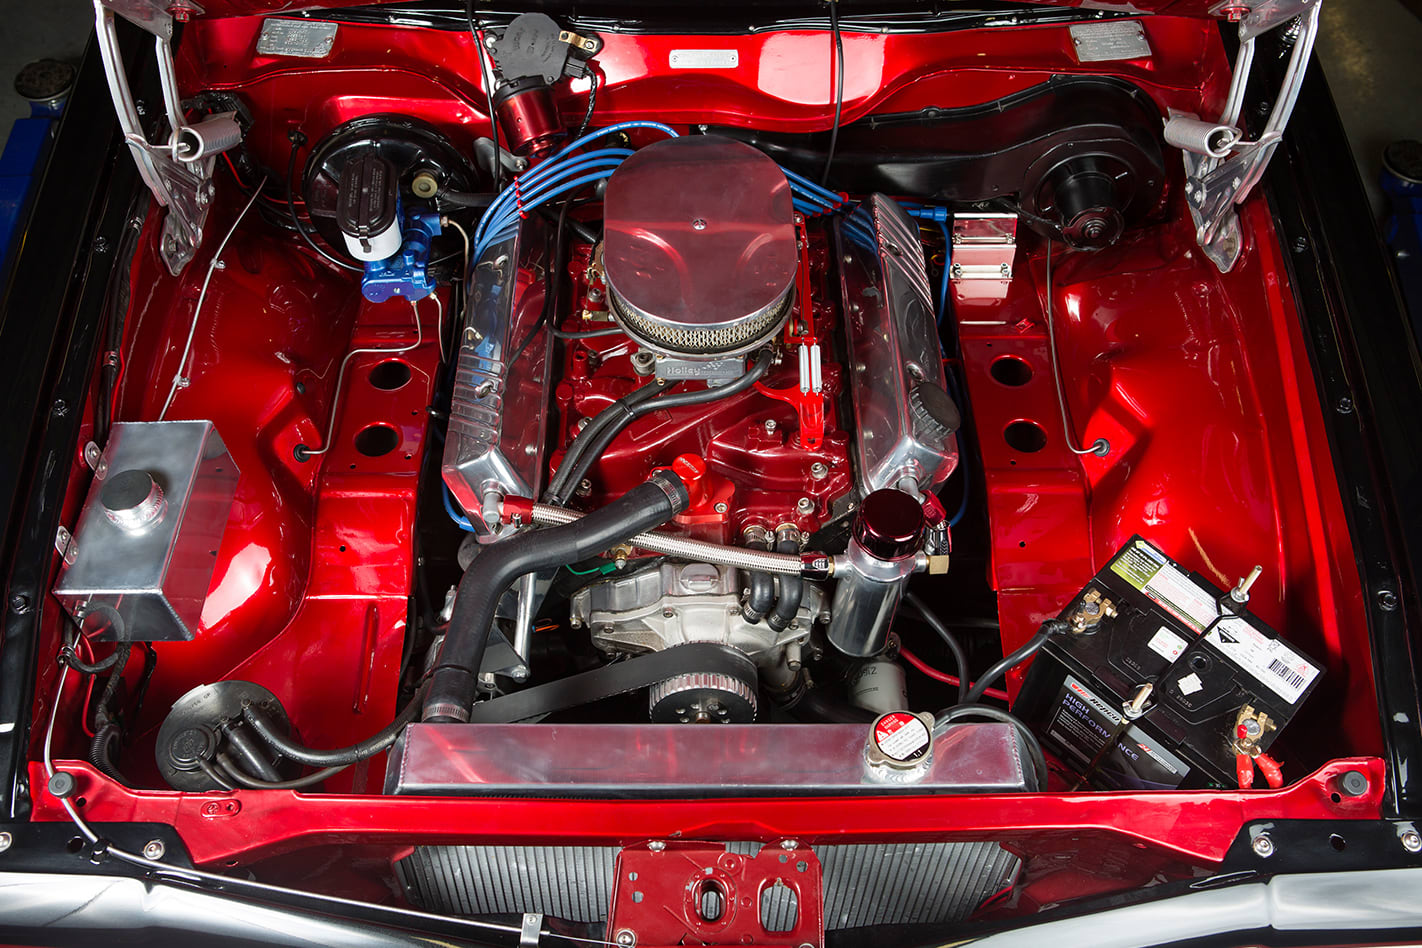 Holden Torana engine bay